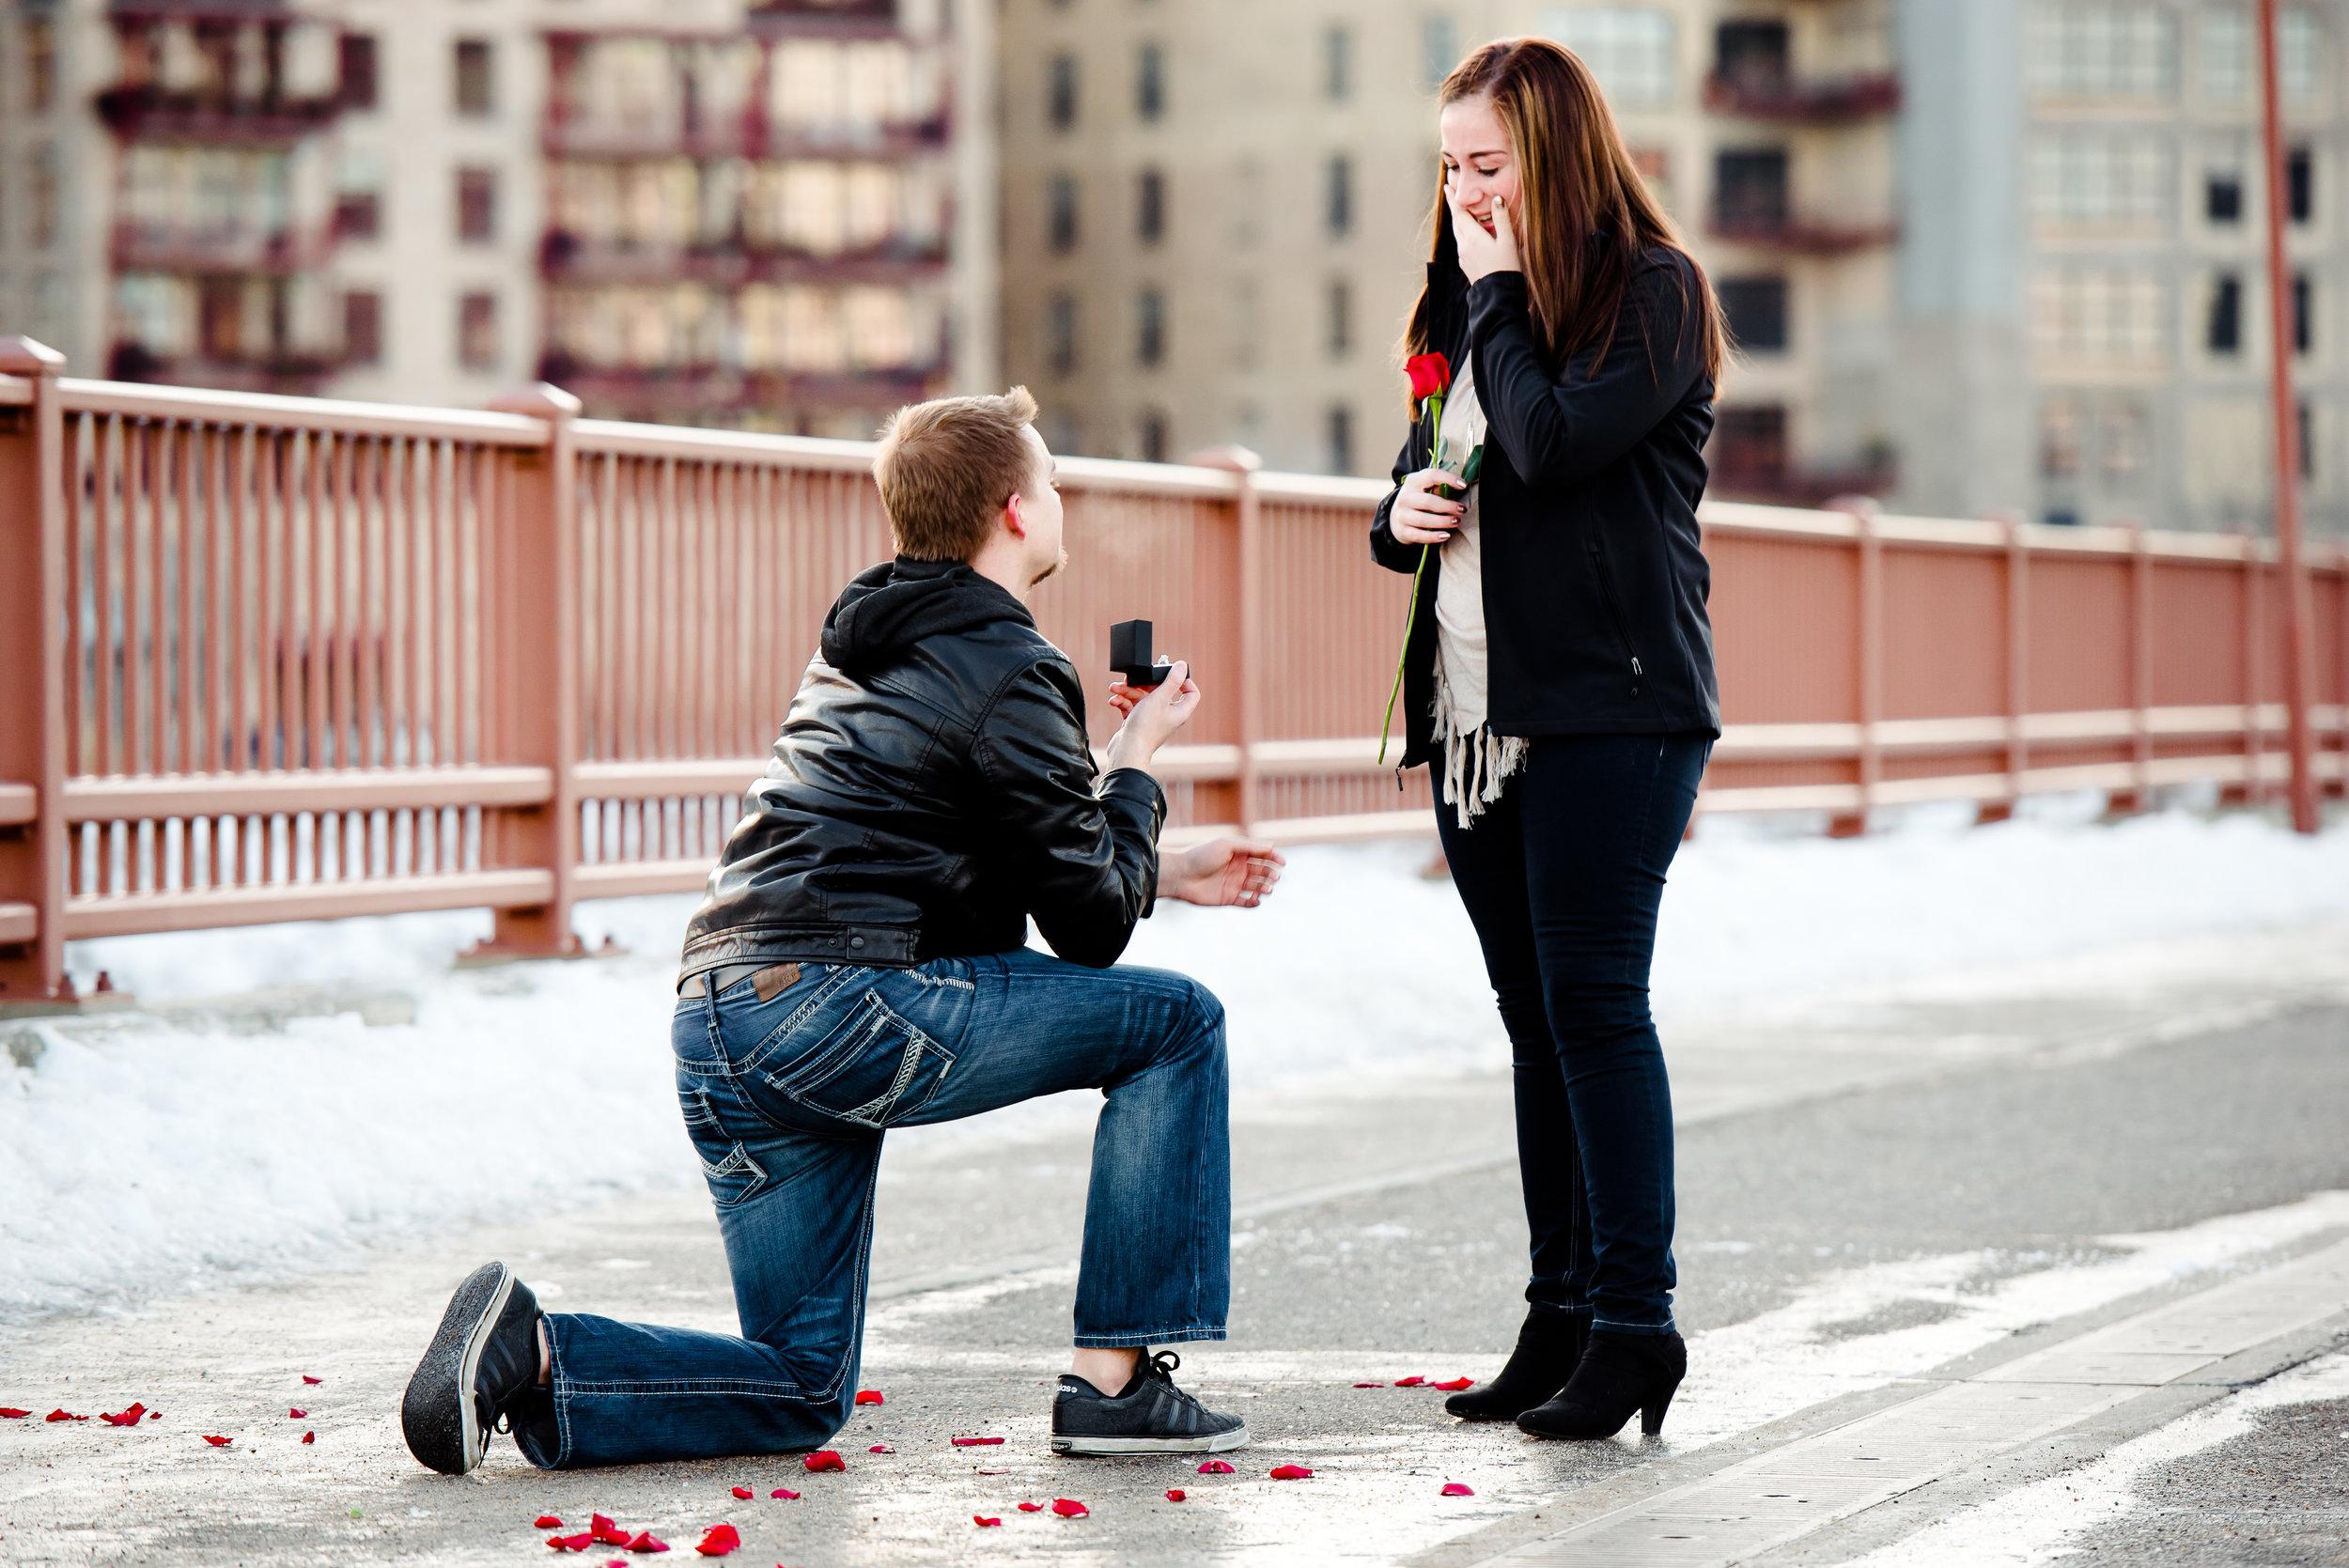 Stone Arch Bridge Marriage Proposal - Winter Engagement at Sunset - Minneapolis Proposal Photographer MN